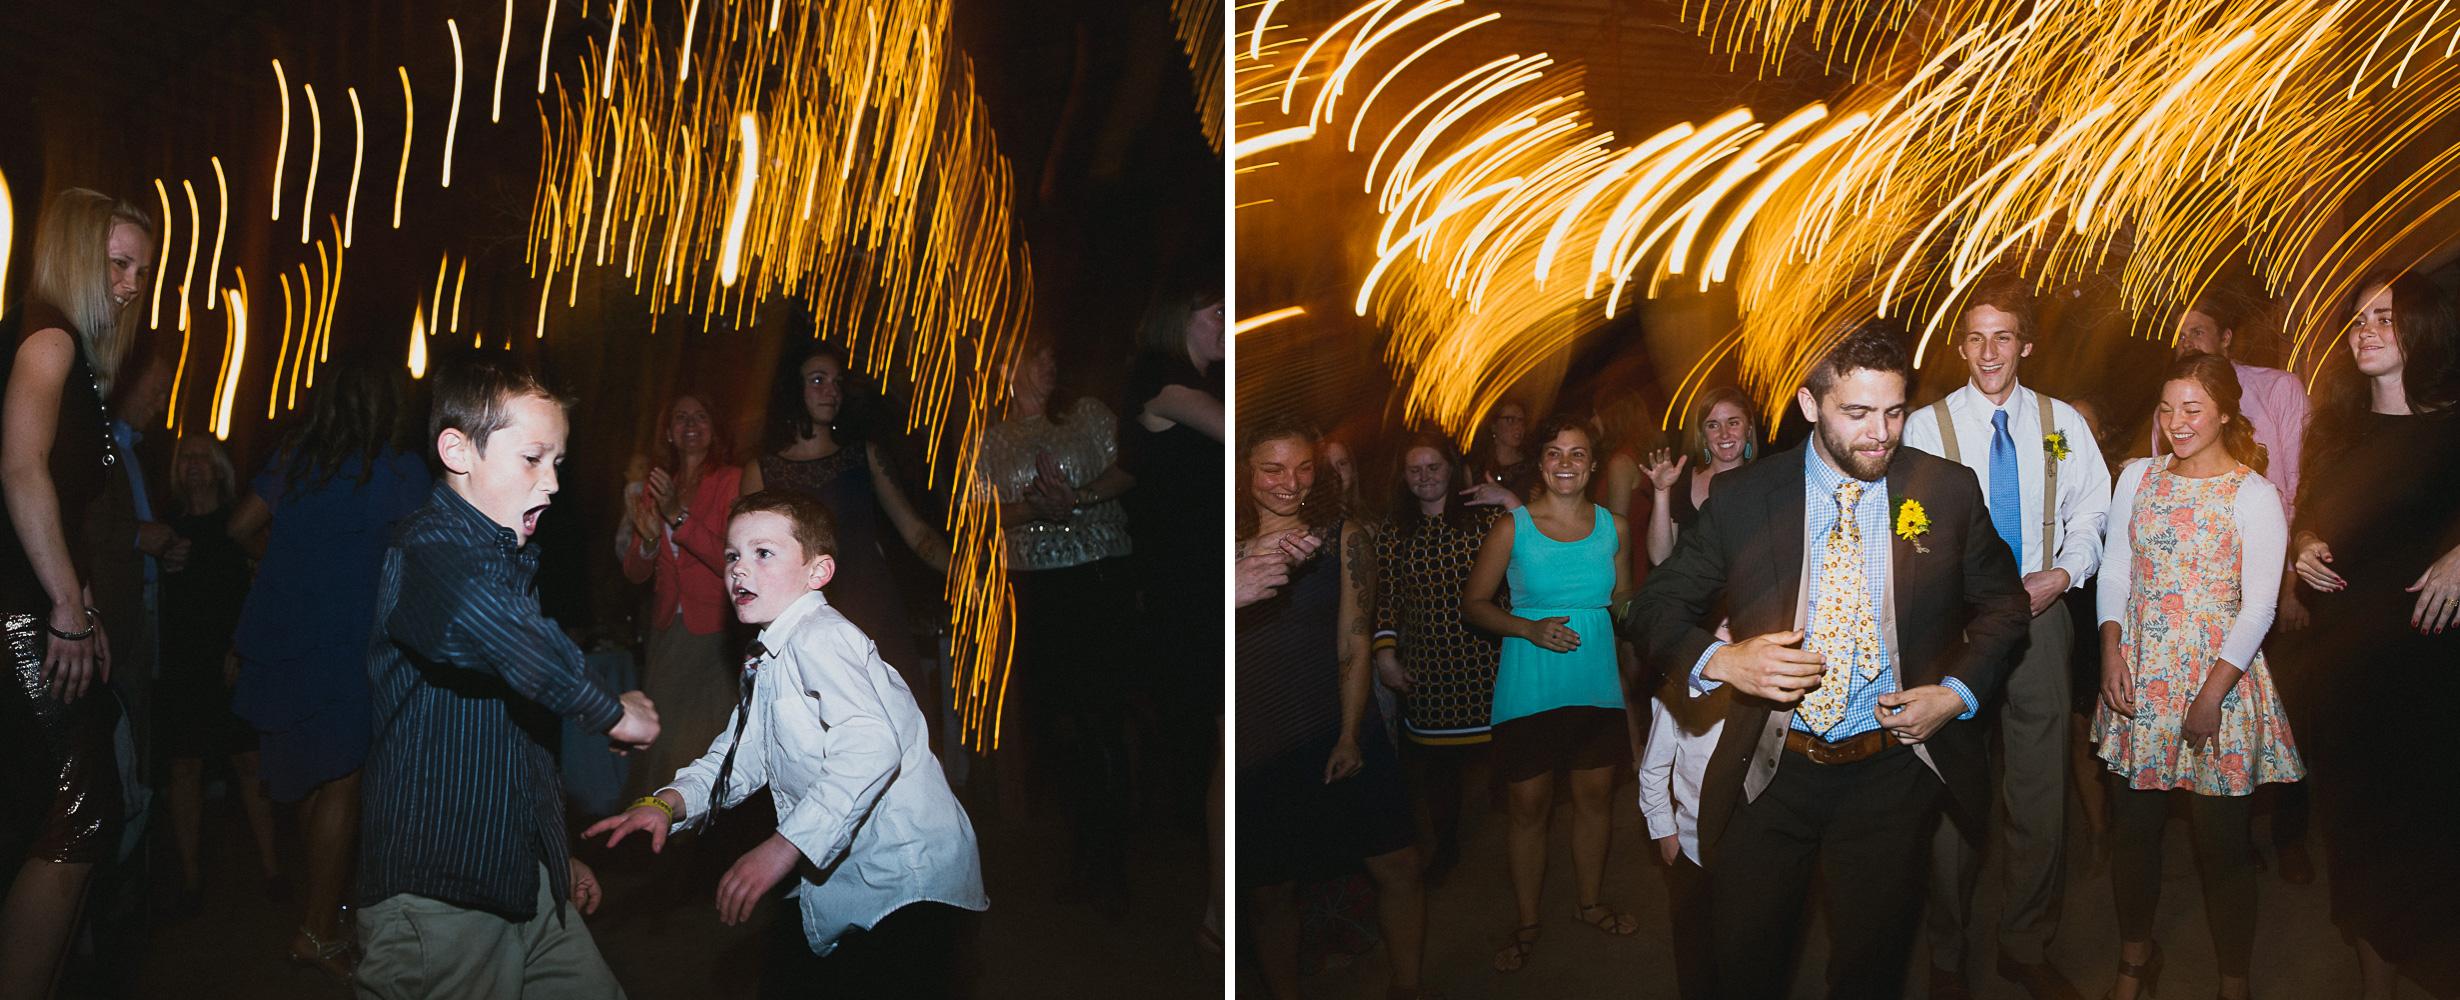 Salt-Lake-City-Wedding-Photographer-Utah-019.jpg